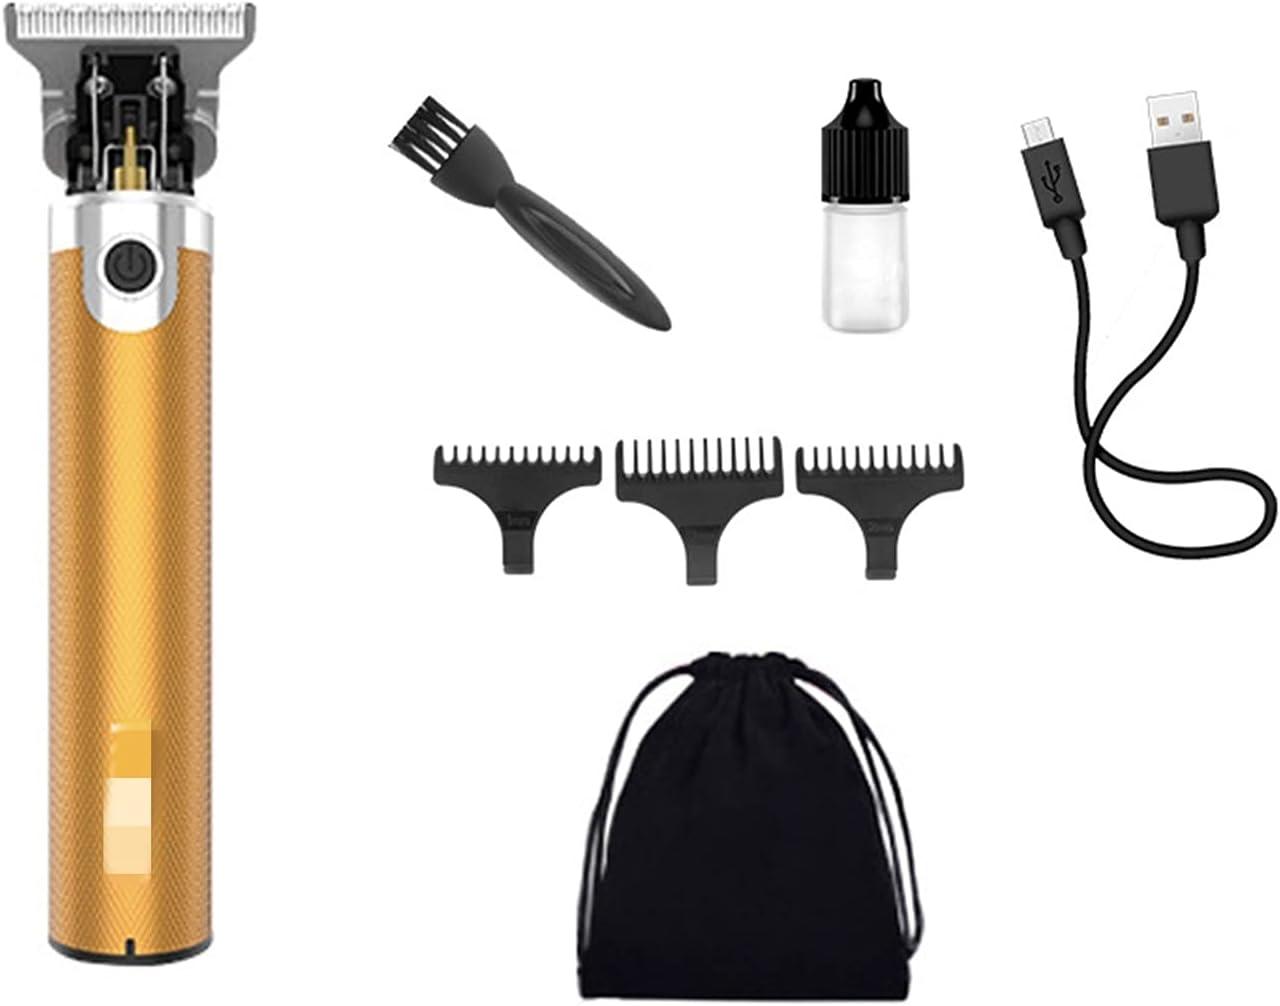 SHUYANshiyu Men's Silent sale Wireless Electric Color Max 82% OFF Hair Clipper :